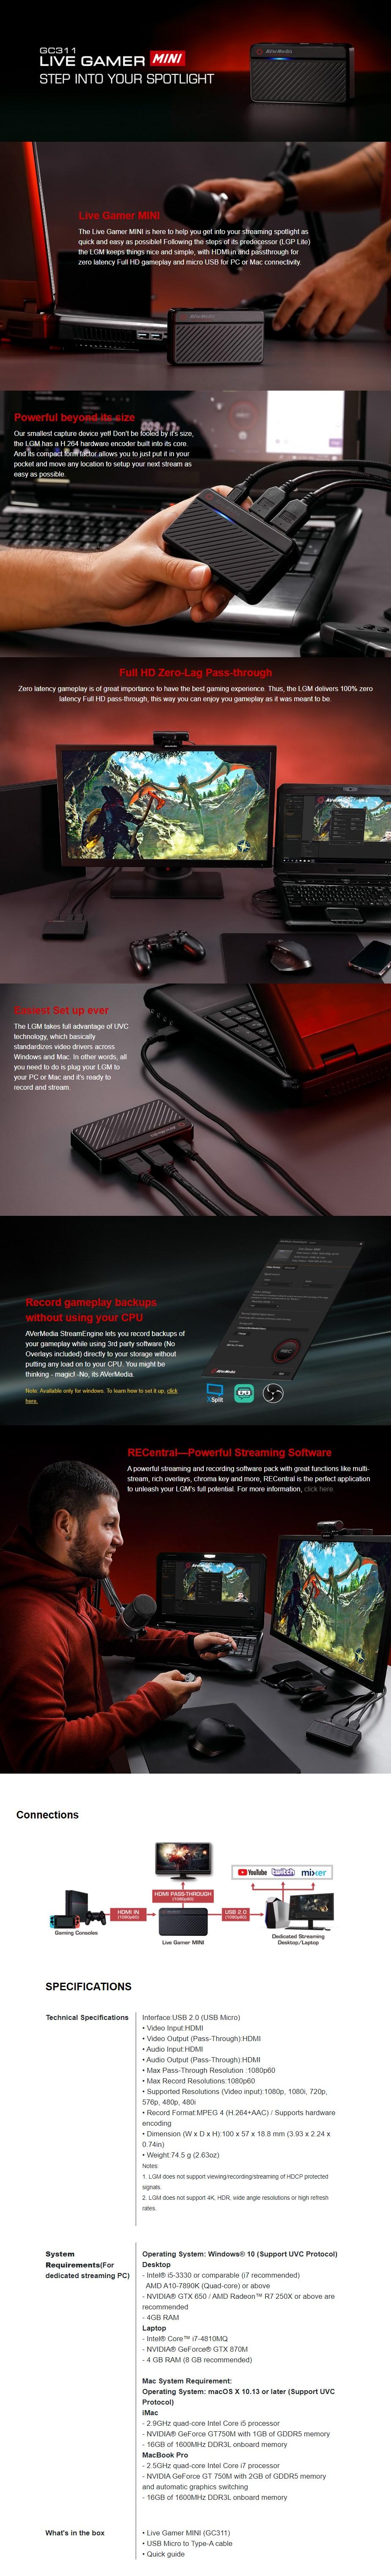 AVerMedia GC311 Live Gamer MINI Full HD Game Capture Card - Overview 1